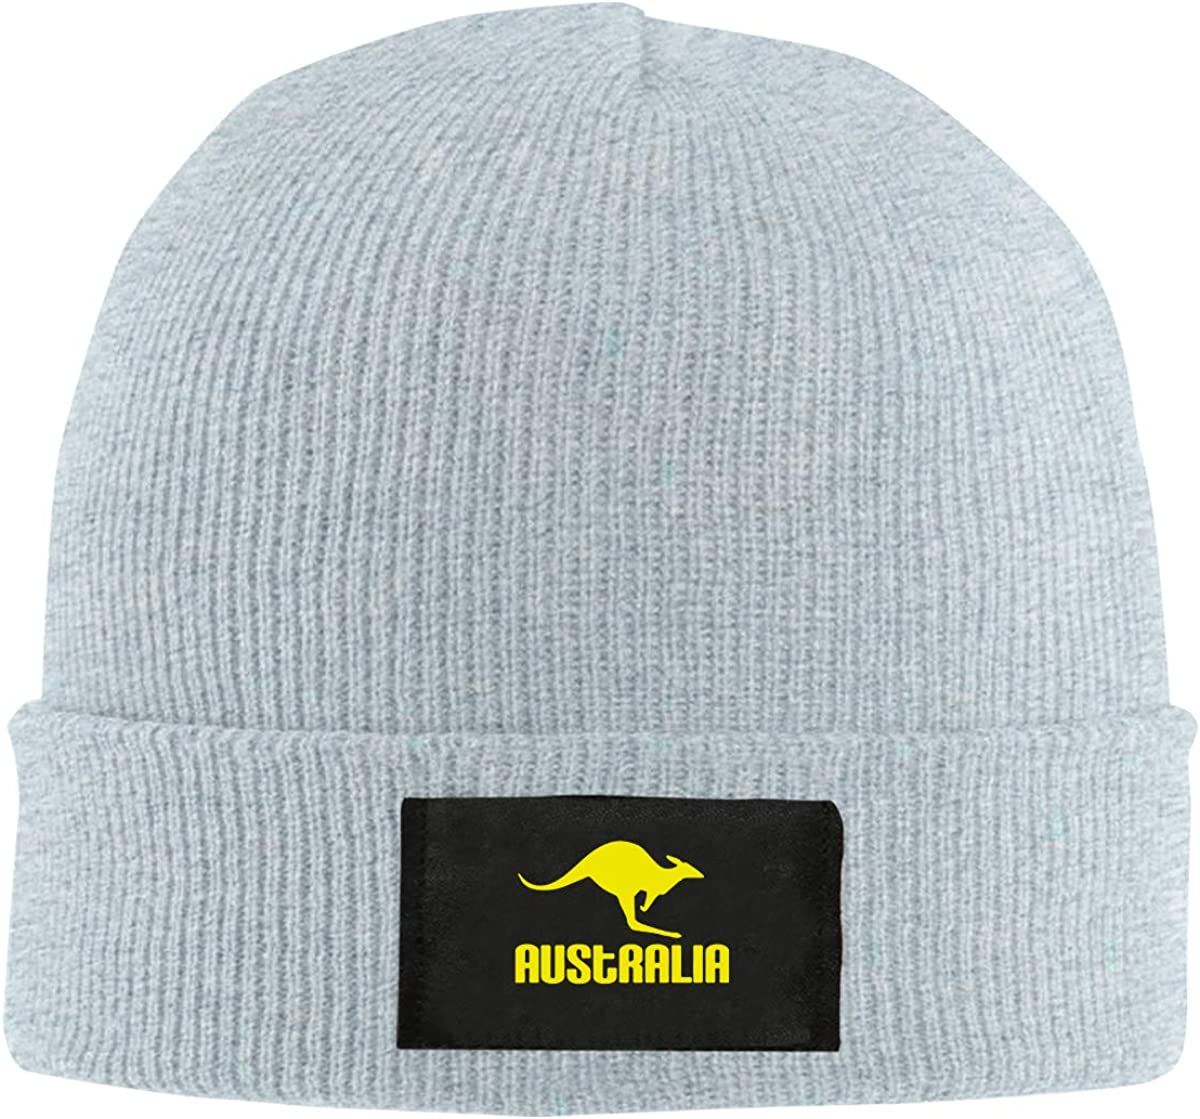 Australia Kangaroo Winter Beanie Hat Knit Hat Cap for Men /& Women